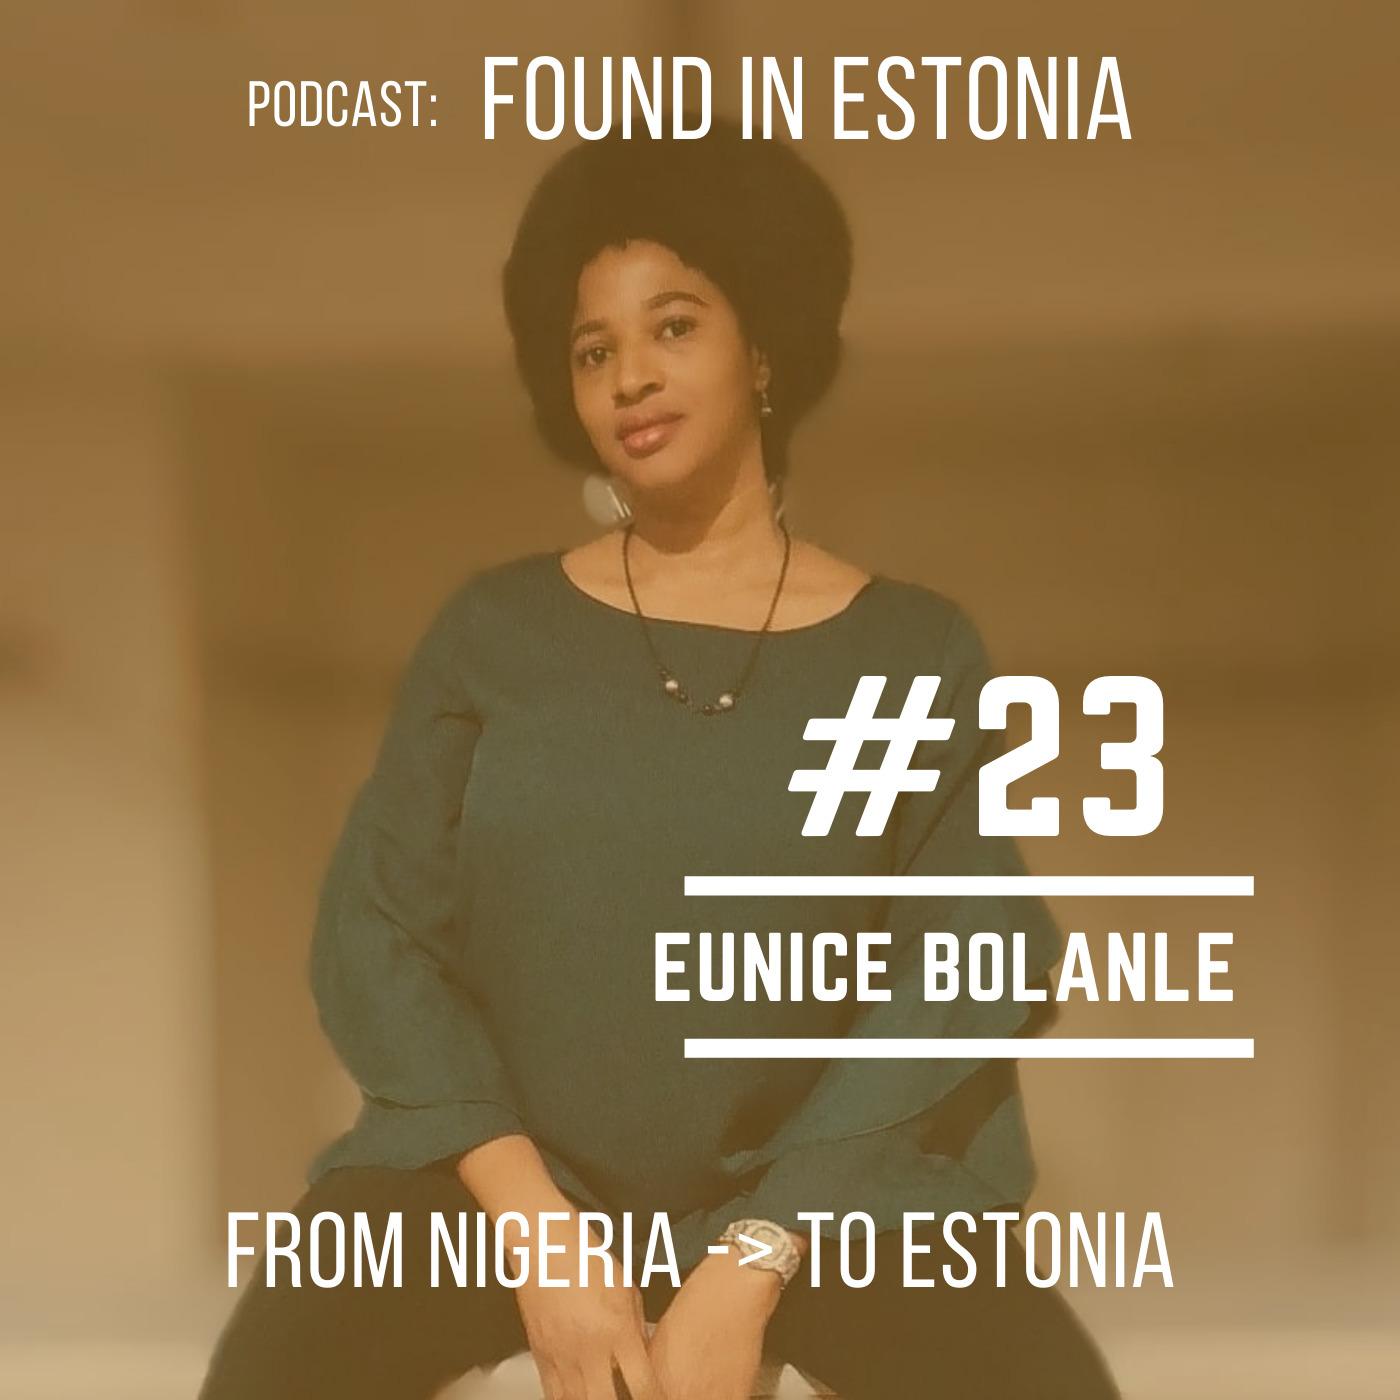 #23 Eunice Bolanle from Nigeria to Estonia